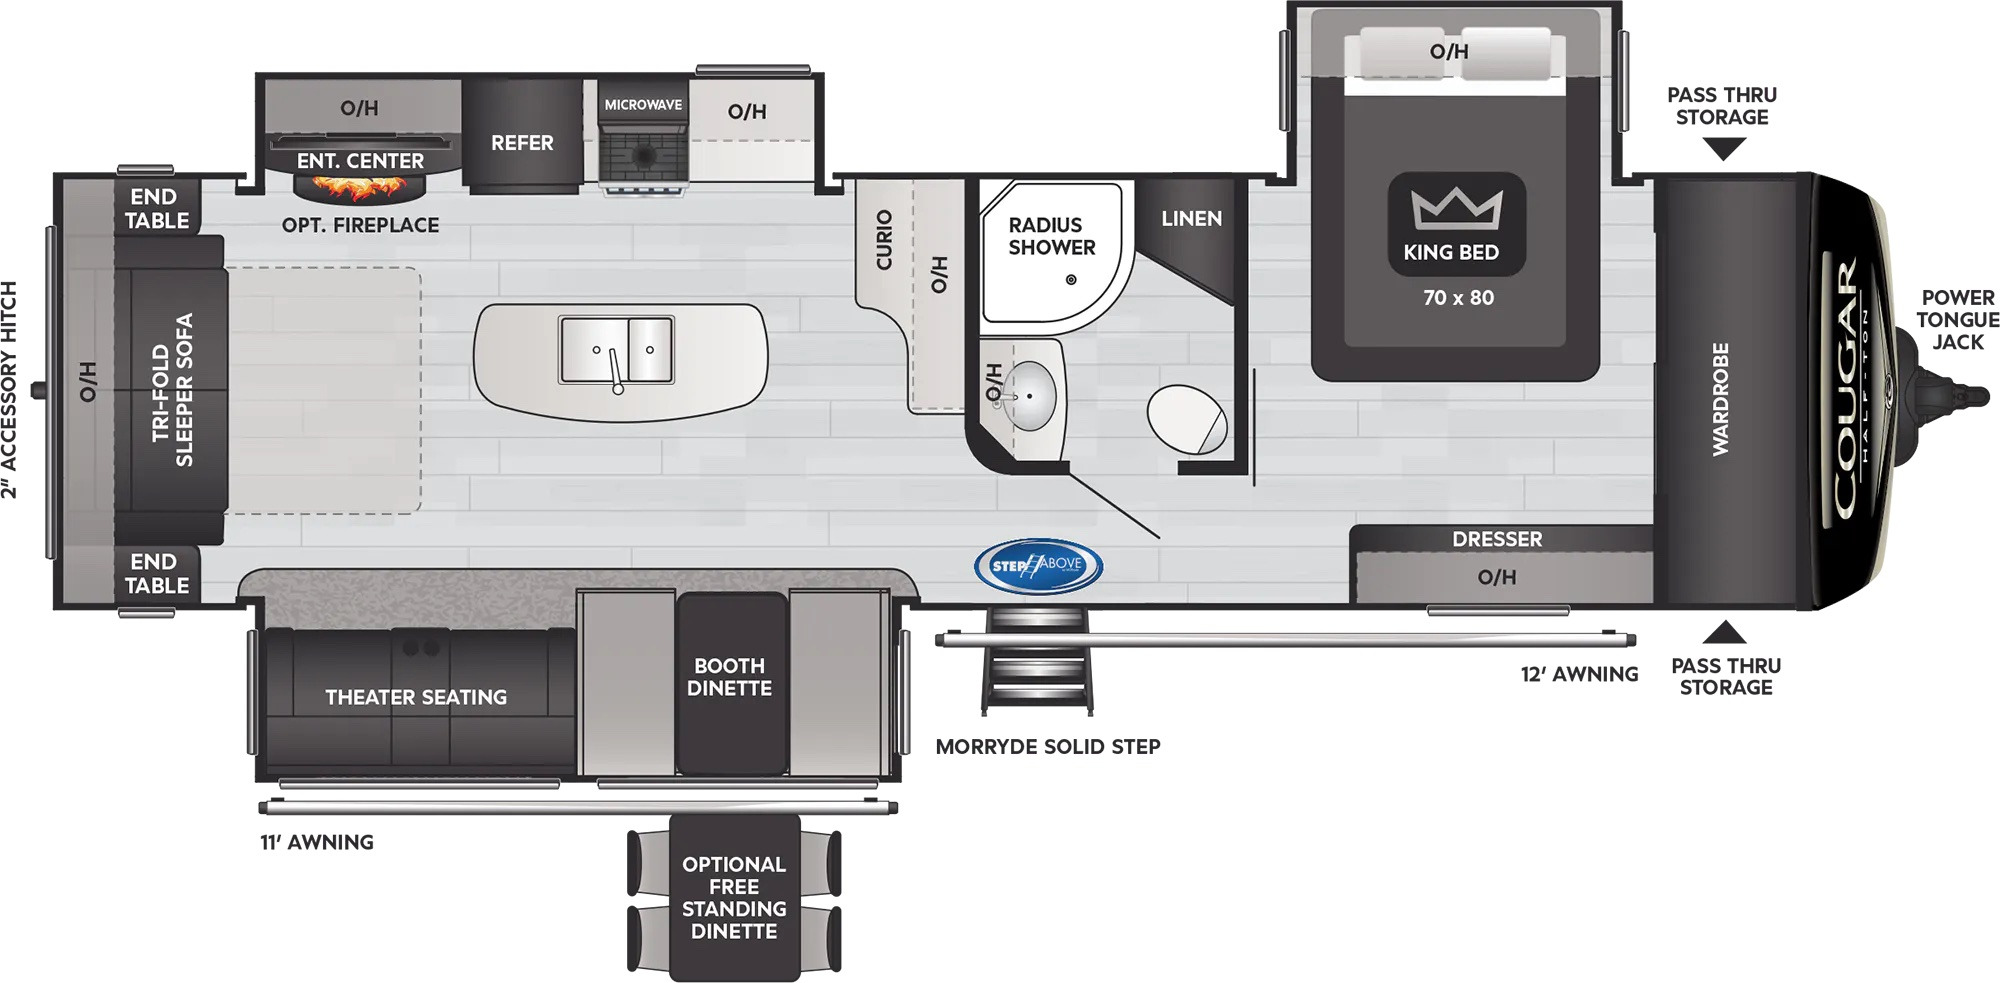 View Floor Plan for 2022 KEYSTONE COUGAR 32RLI